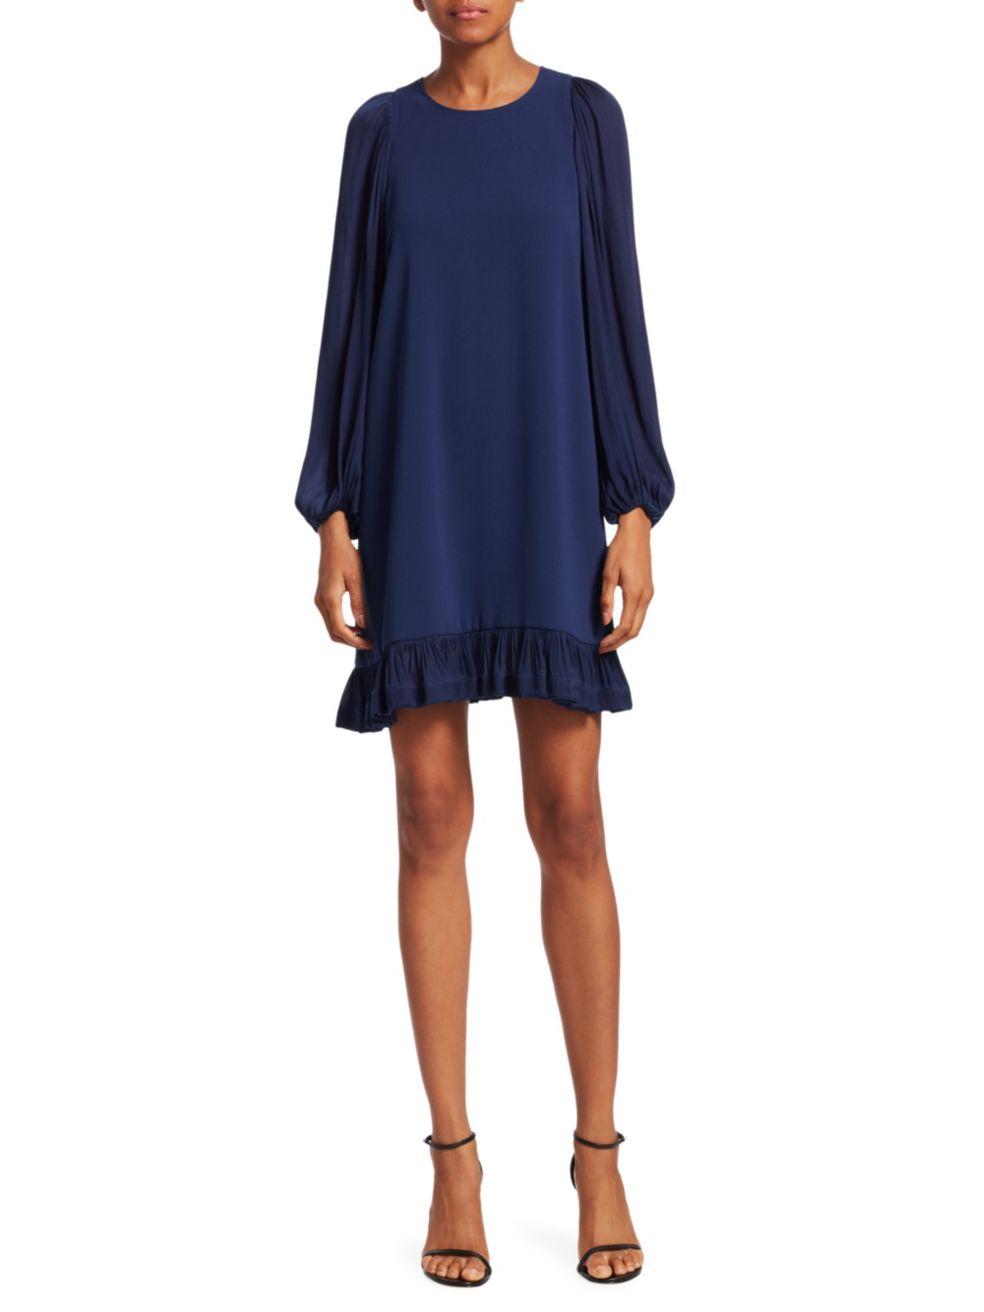 Halston Heritage - Blouse Dress